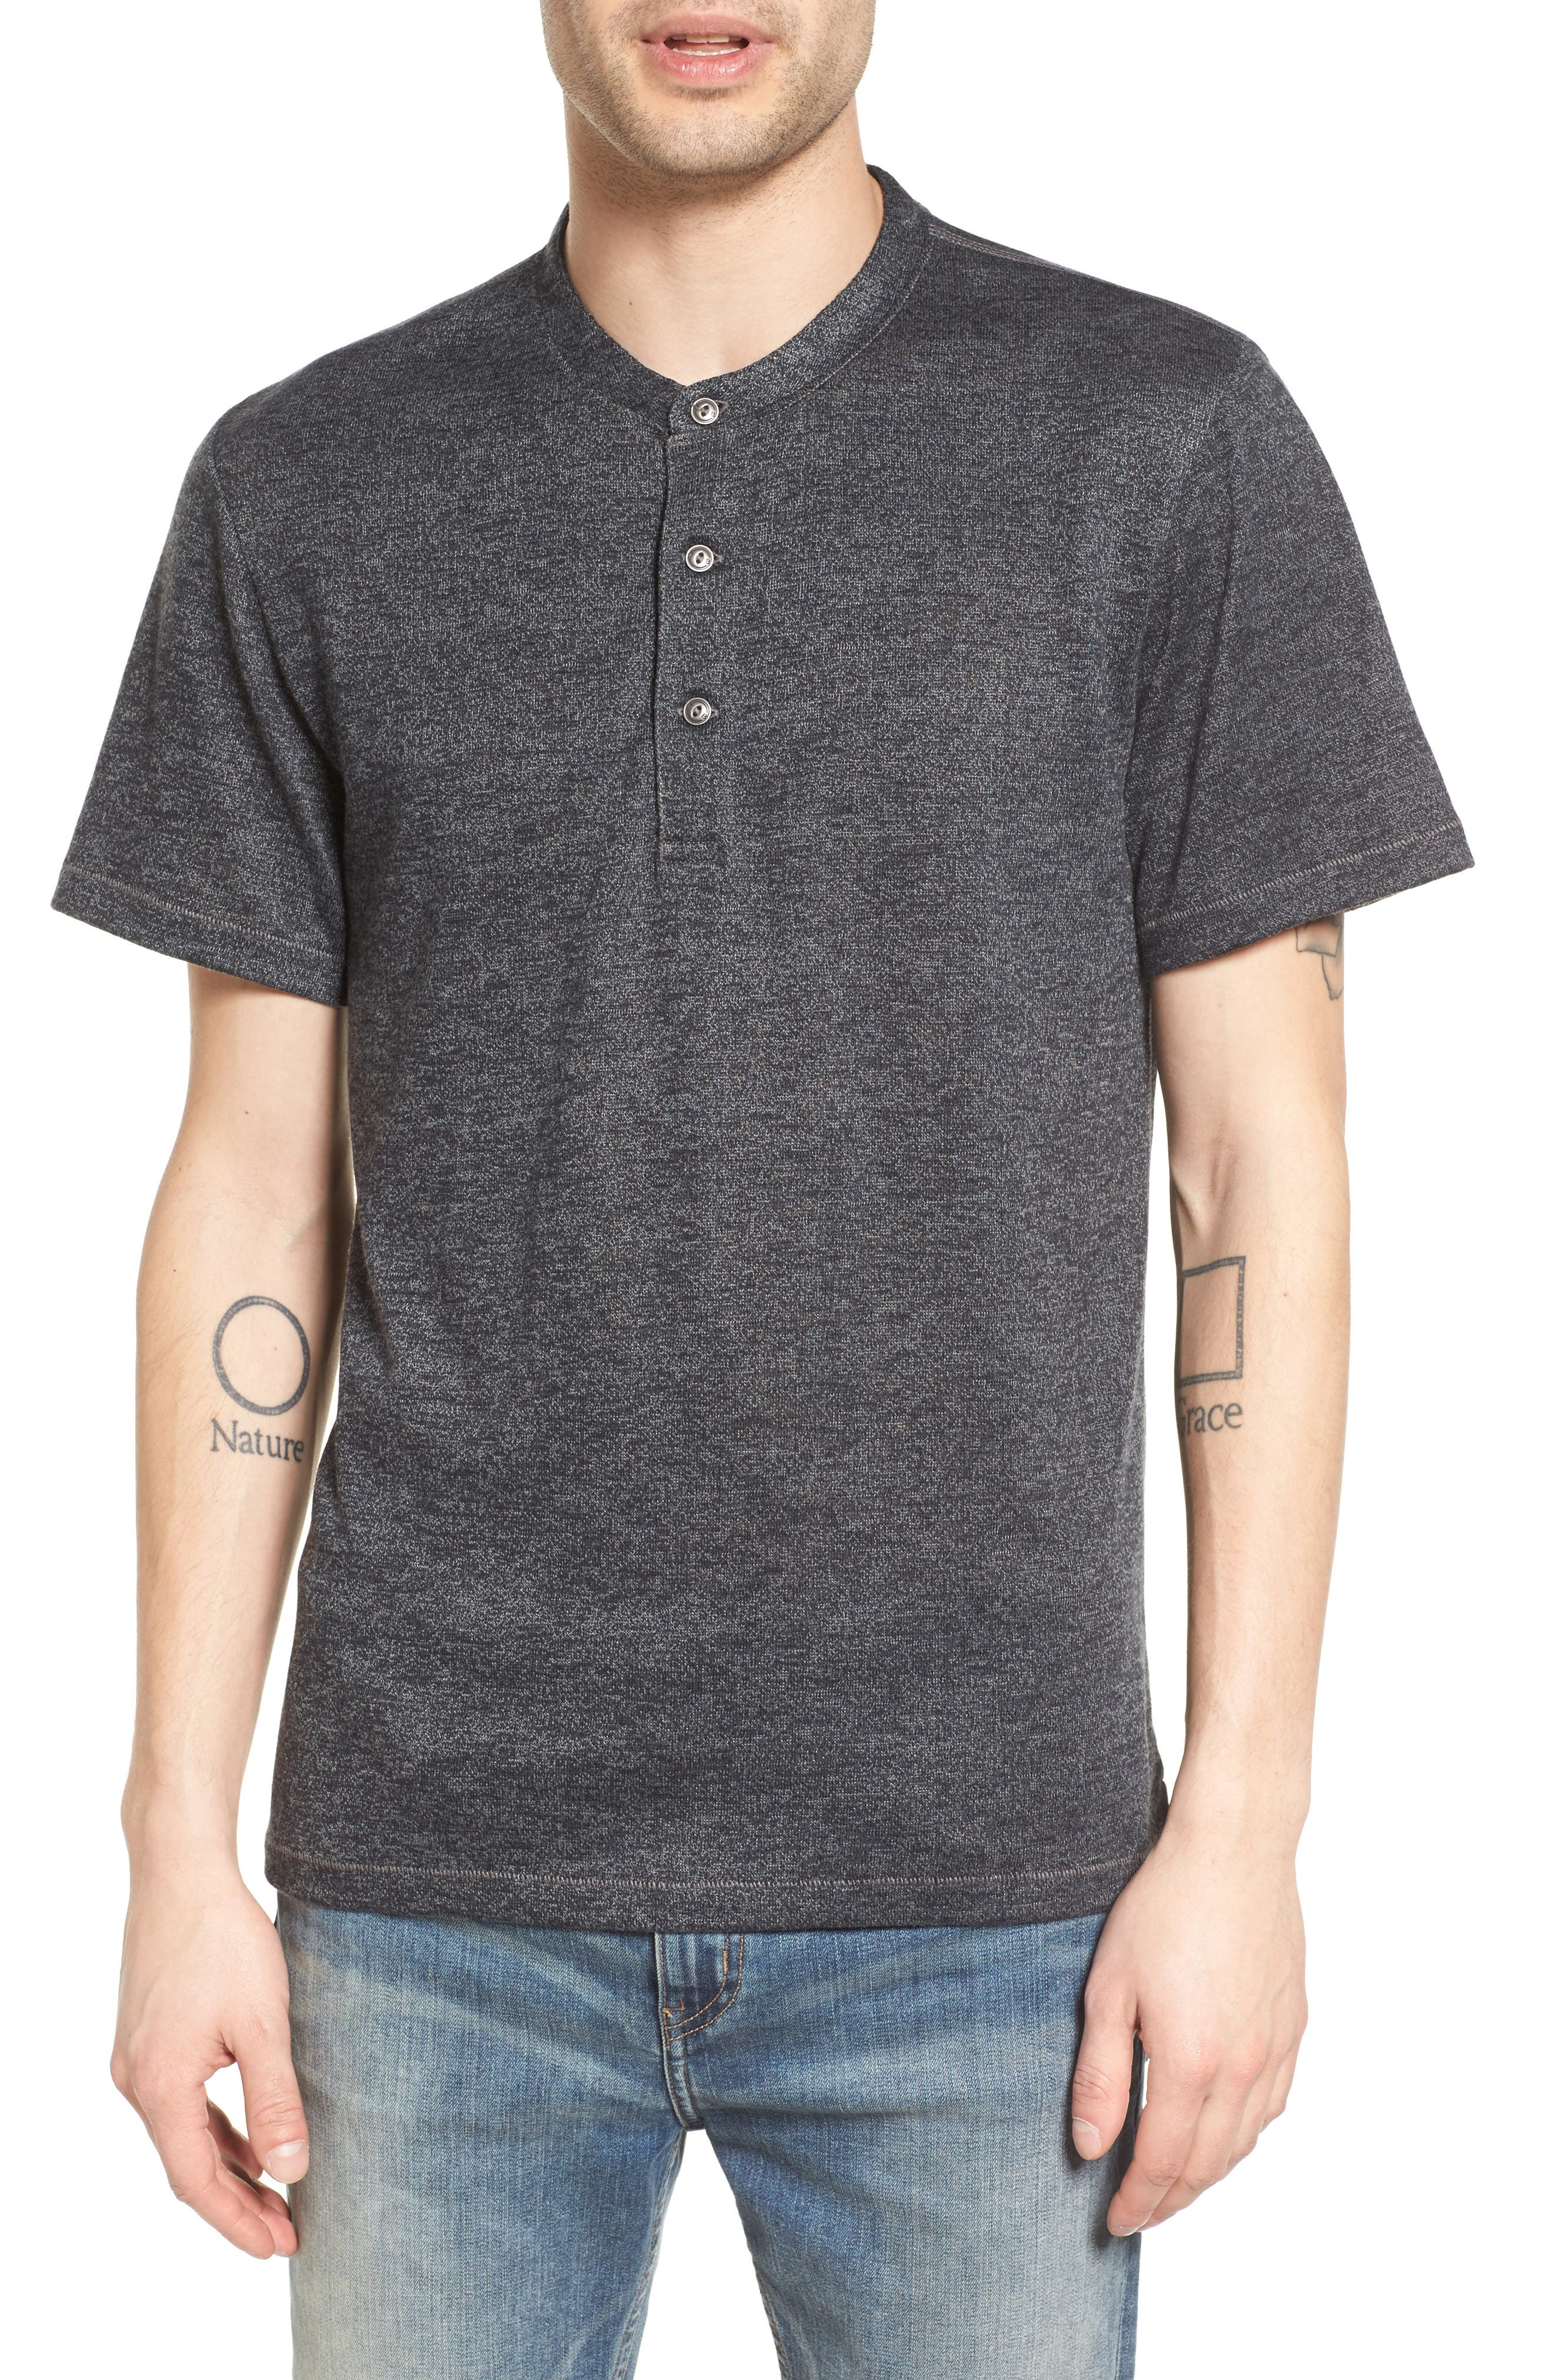 Treasure & Bond Marled Henley T-Shirt